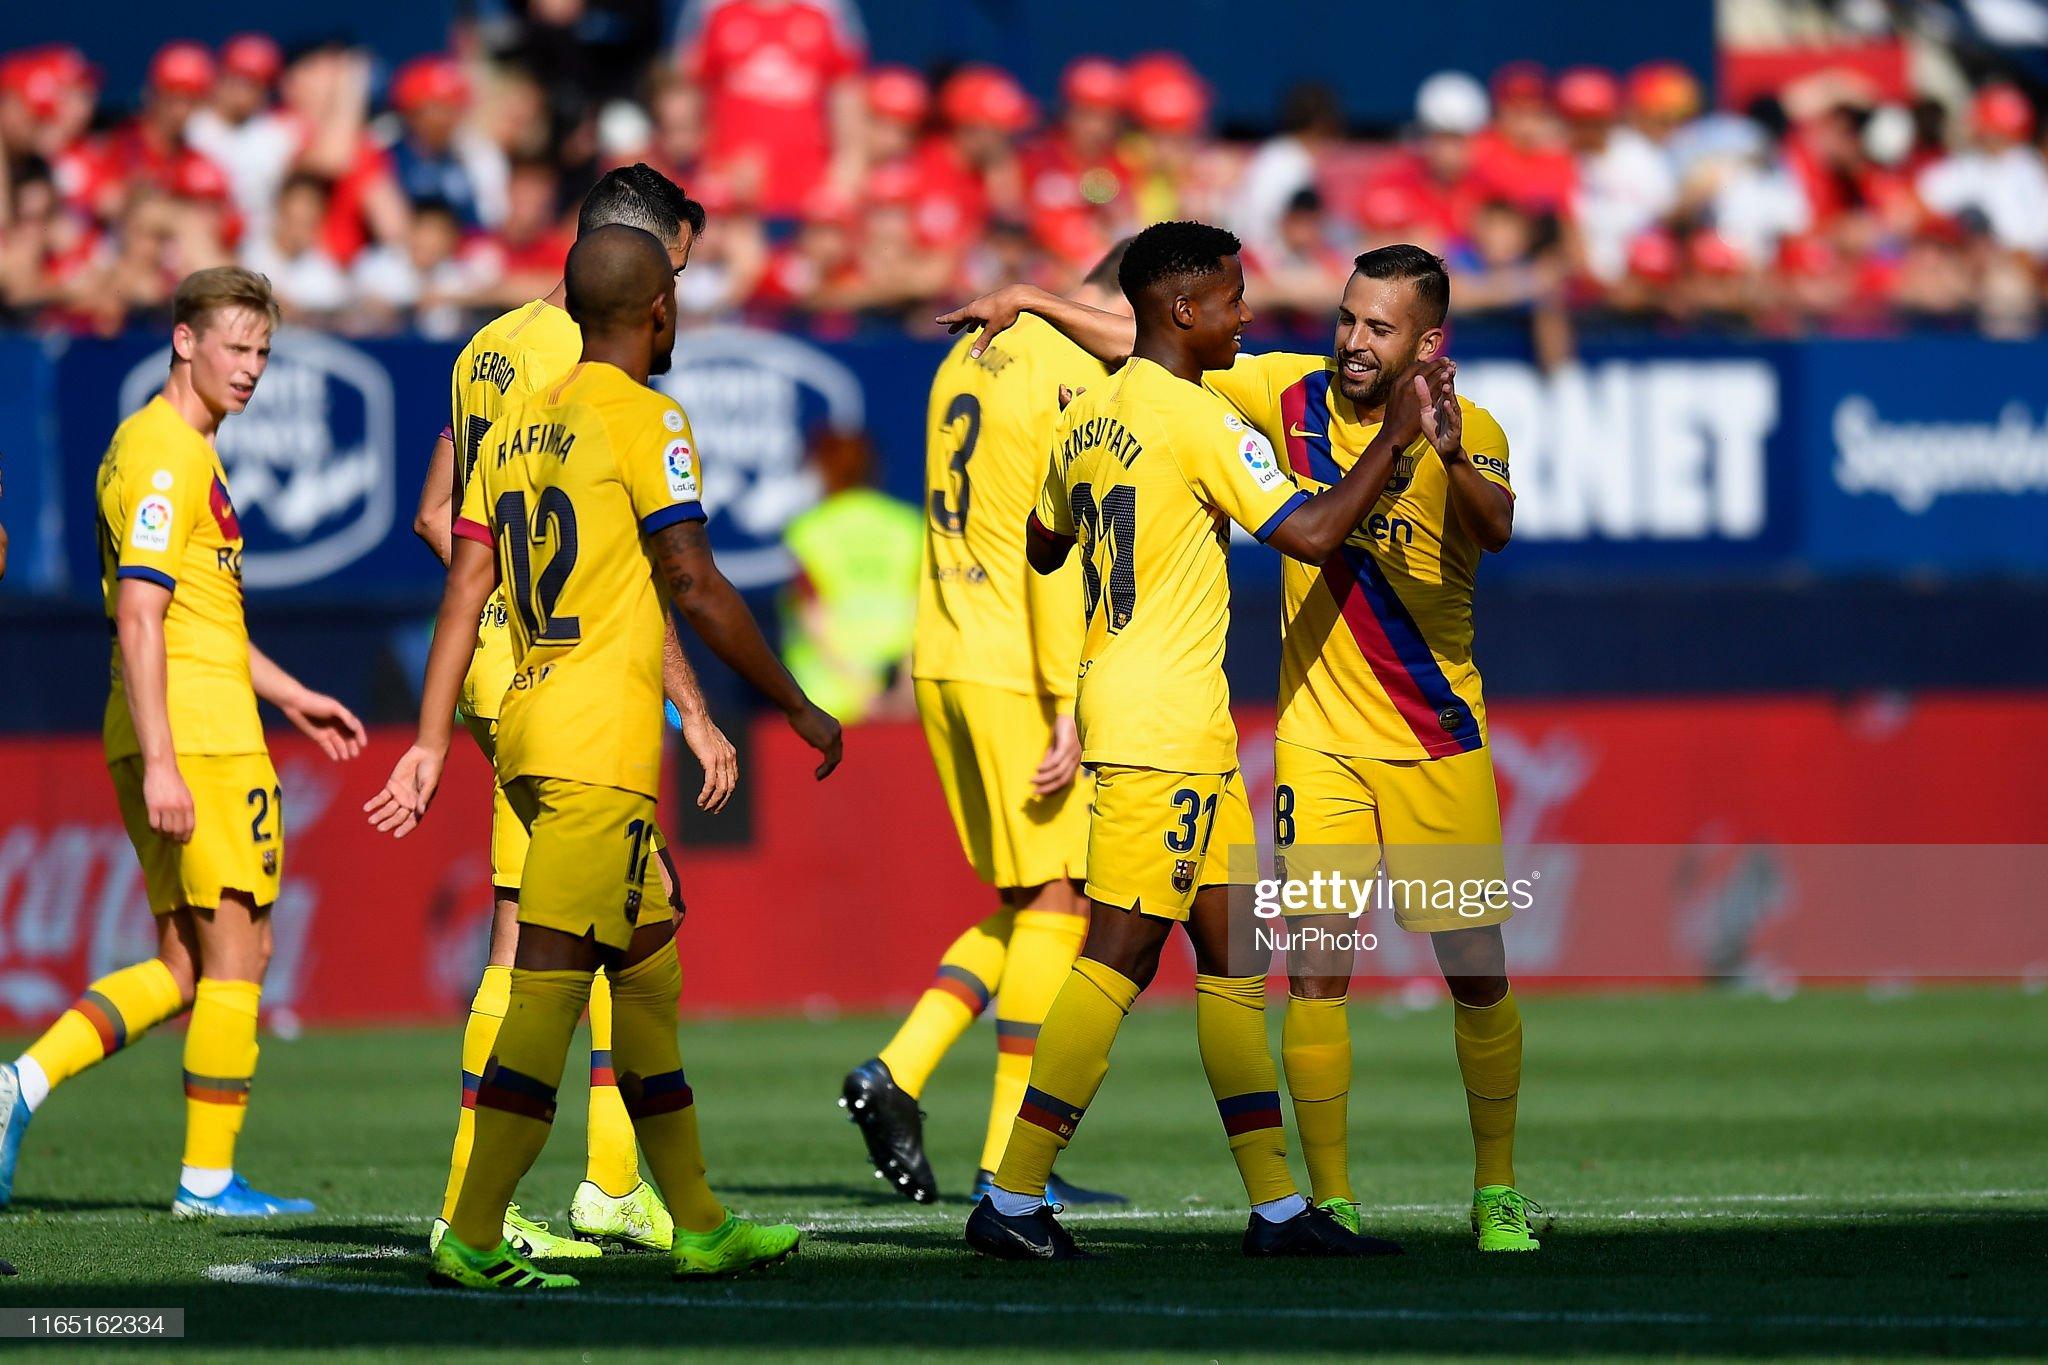 صور مباراة : أوساسونا - برشلونة 2-2 ( 31-08-2019 )  Ansu-fati-of-barcelona-celebrates-after-scoring-his-sides-first-goal-picture-id1165162334?s=2048x2048